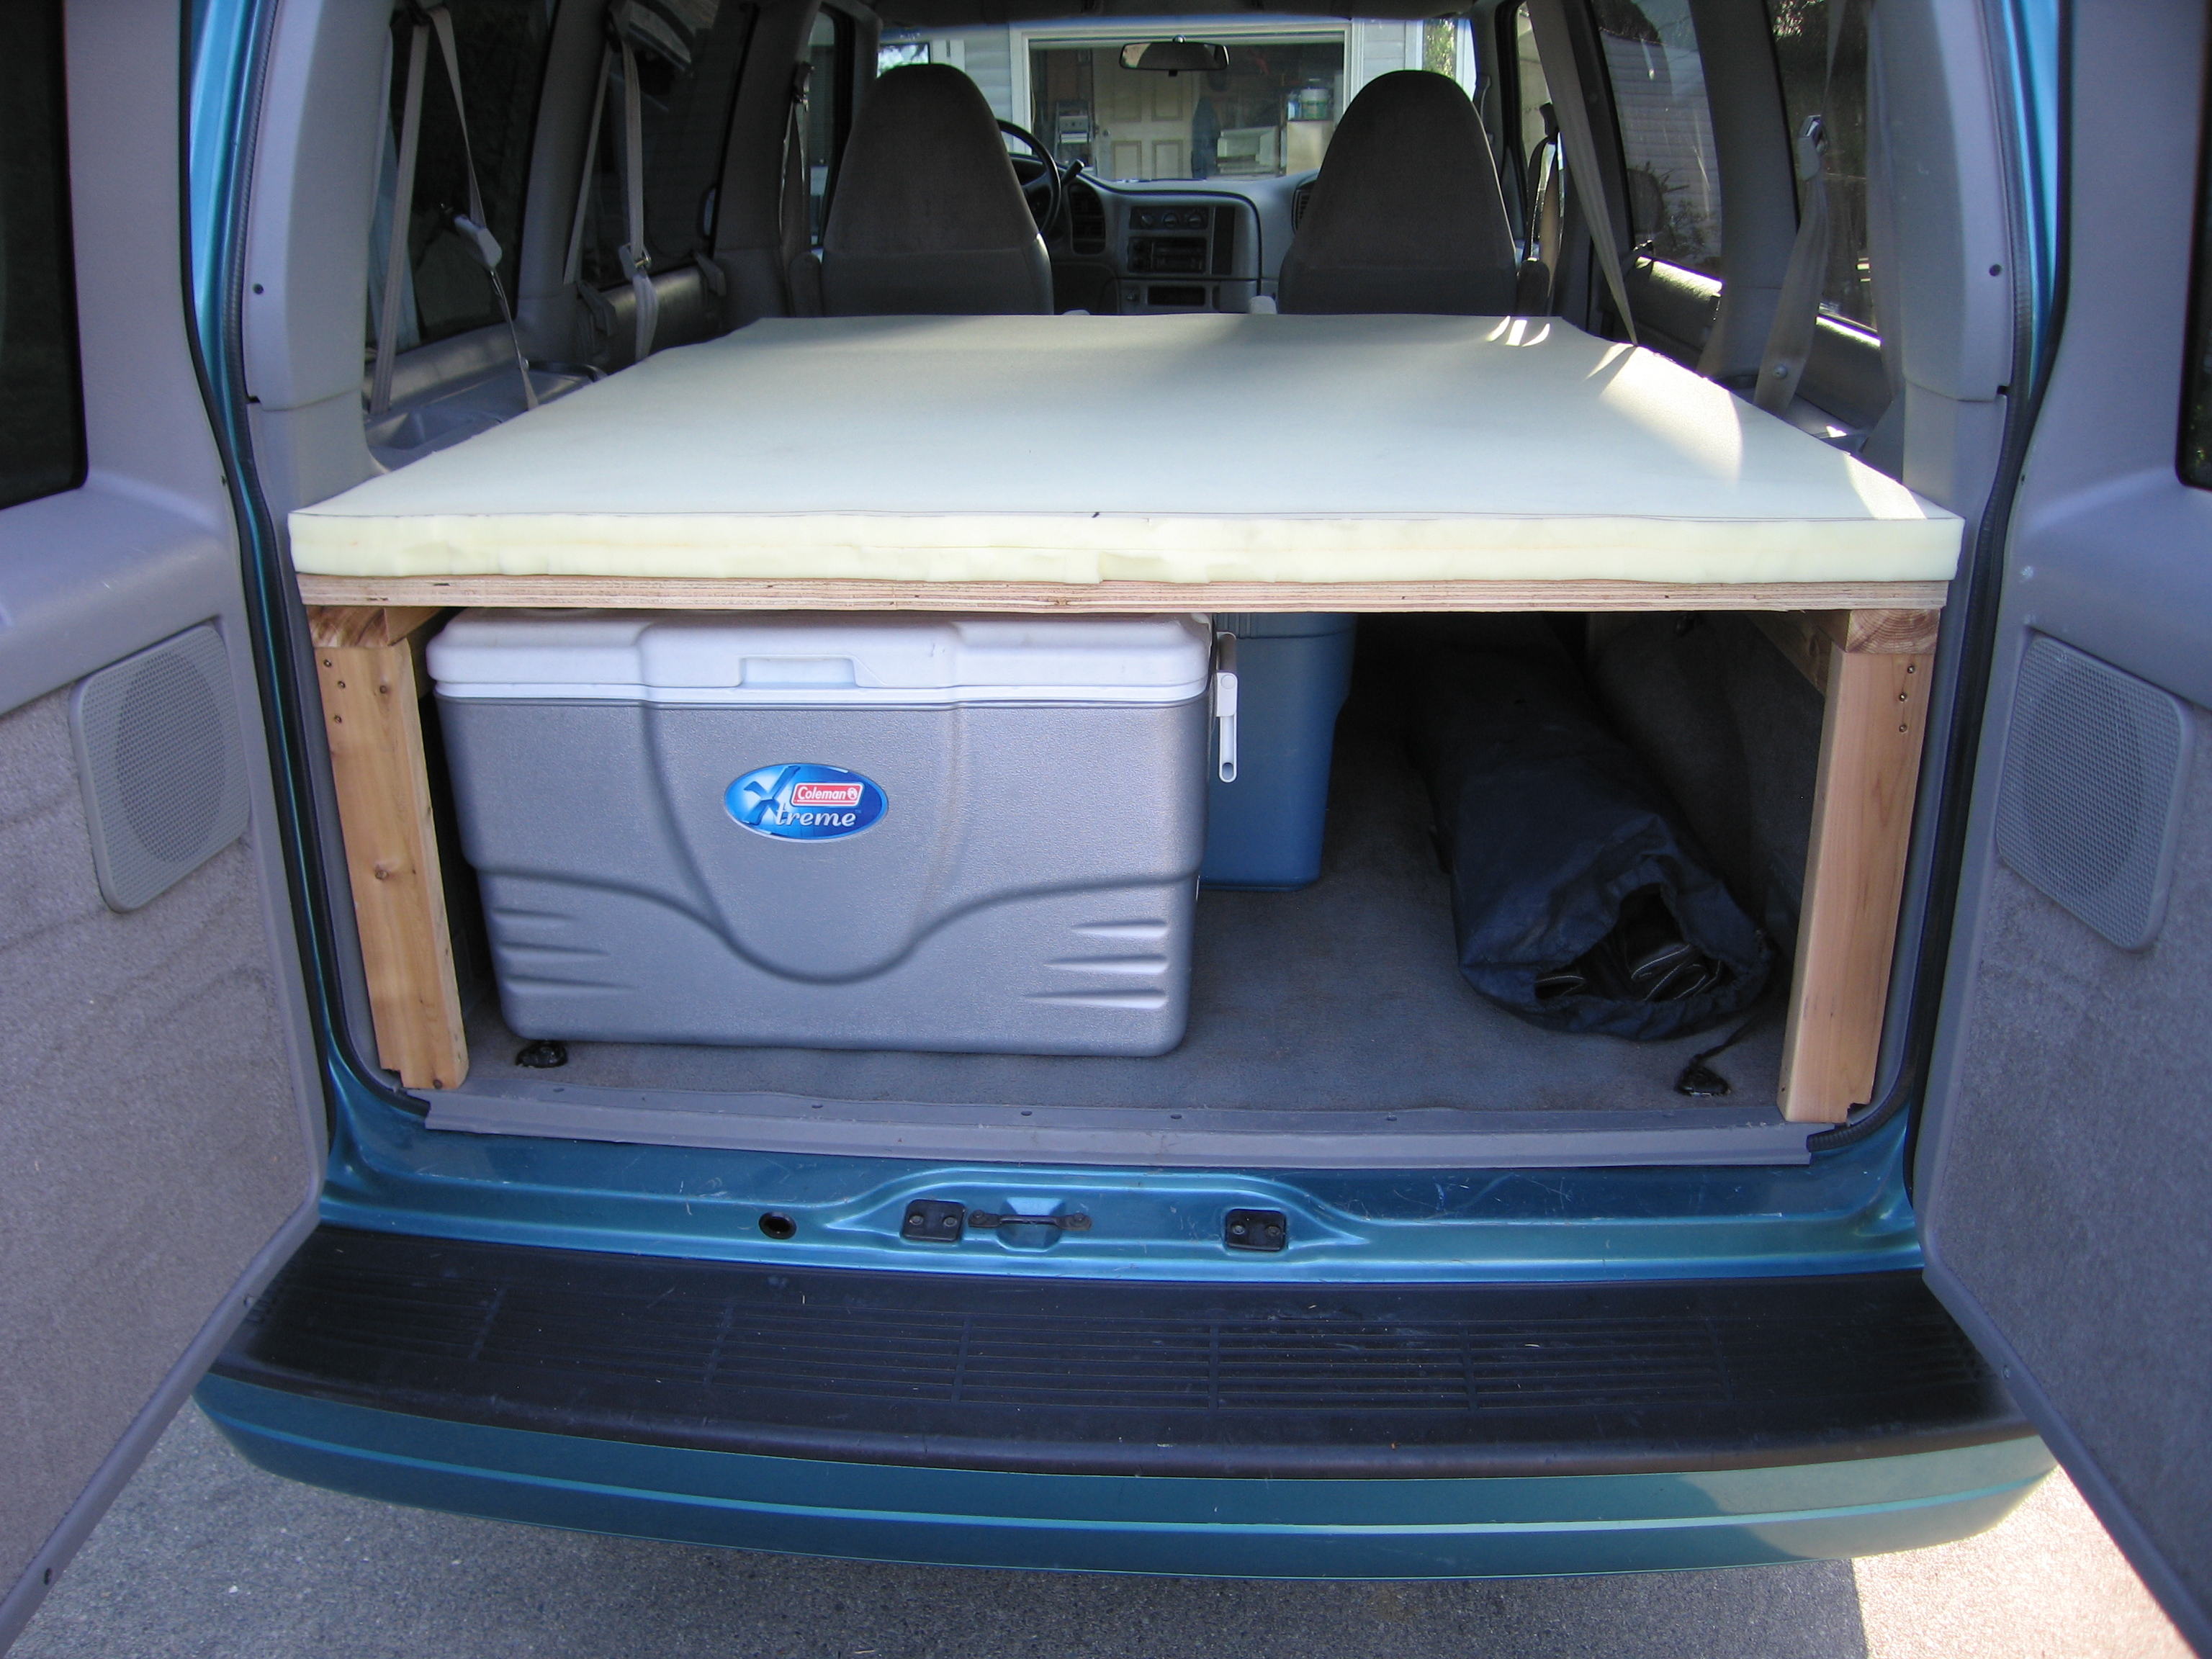 Camping In An Astro Van | Autos Post